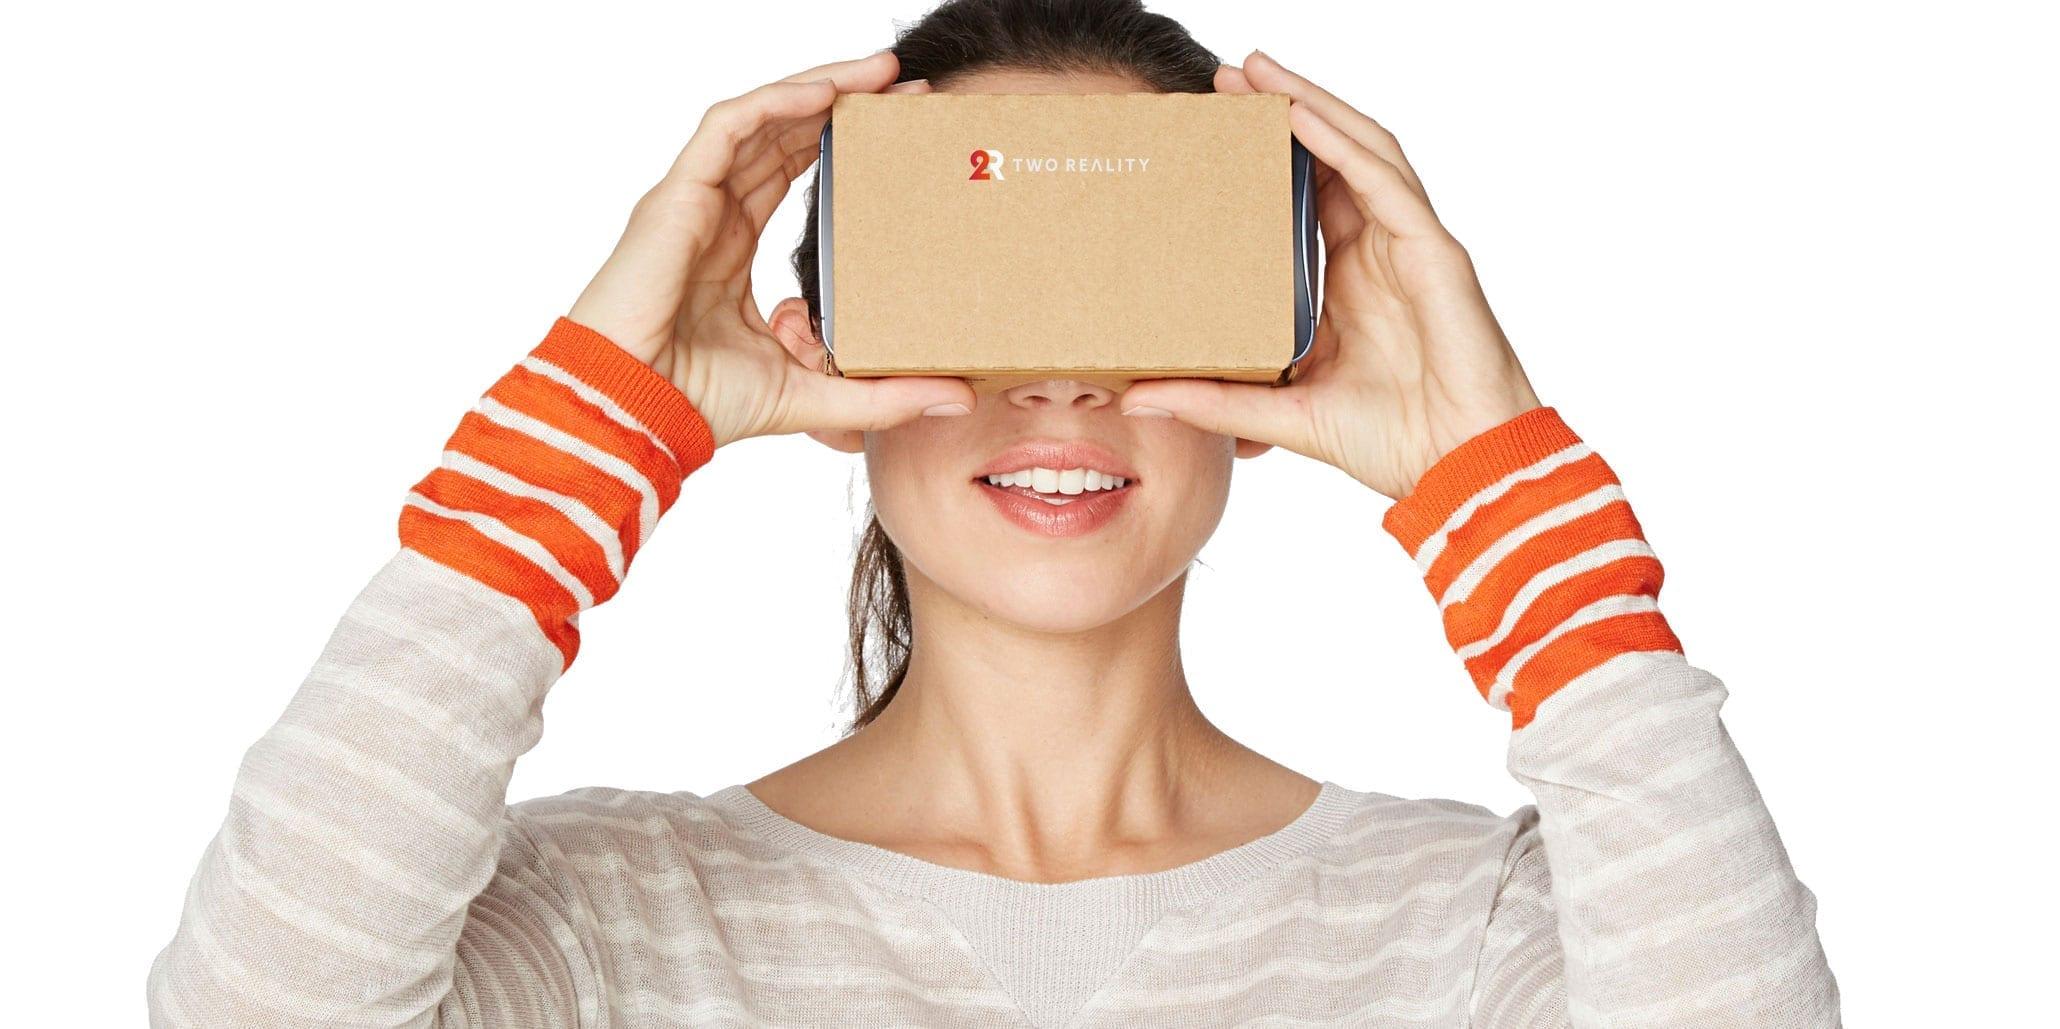 cardboard realidad virtual tworeality